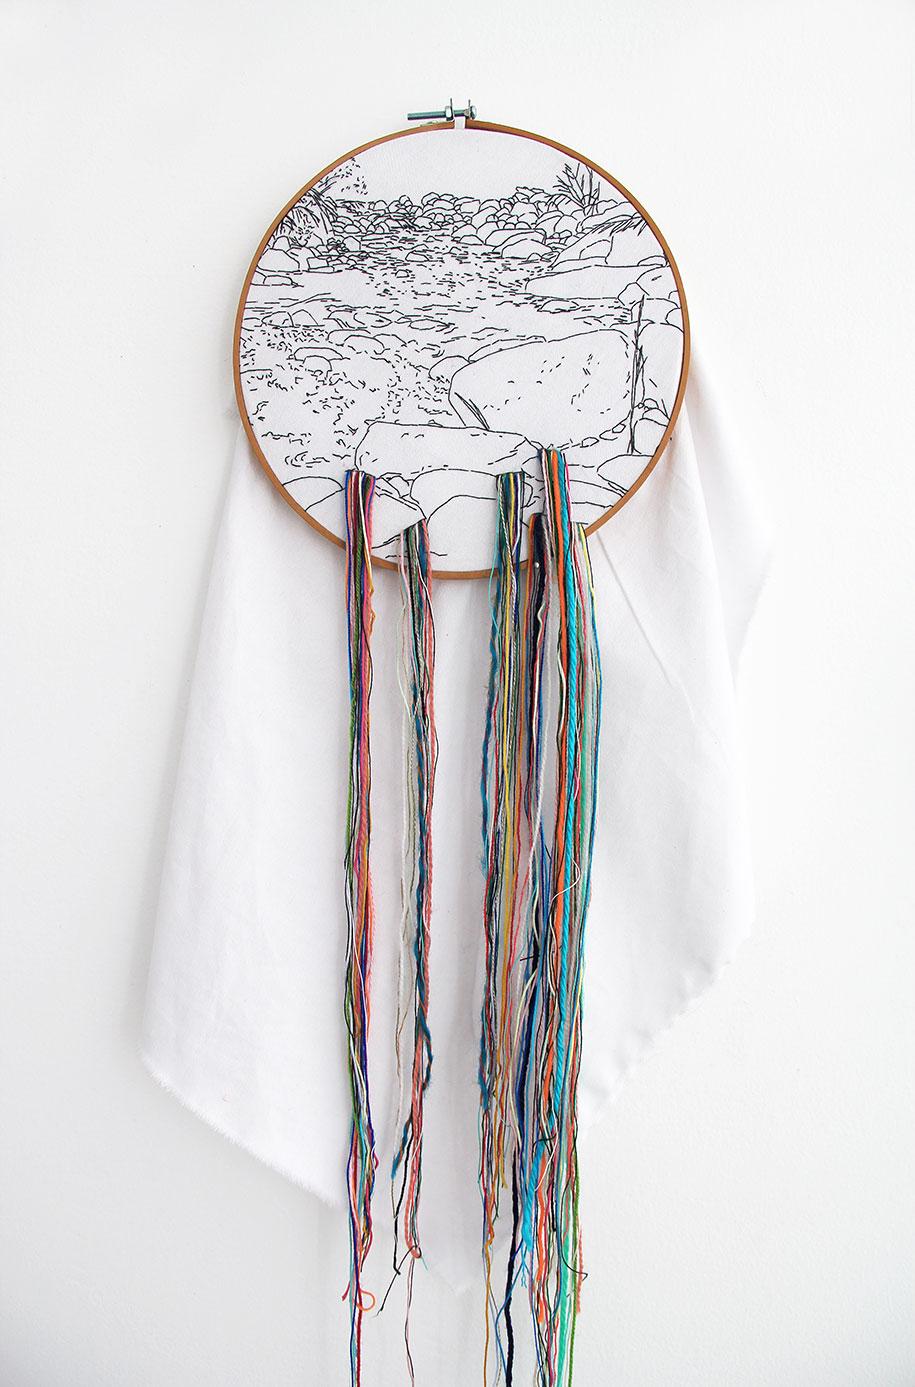 embroidered-landscapes-art-ana-teresa-barboza-8